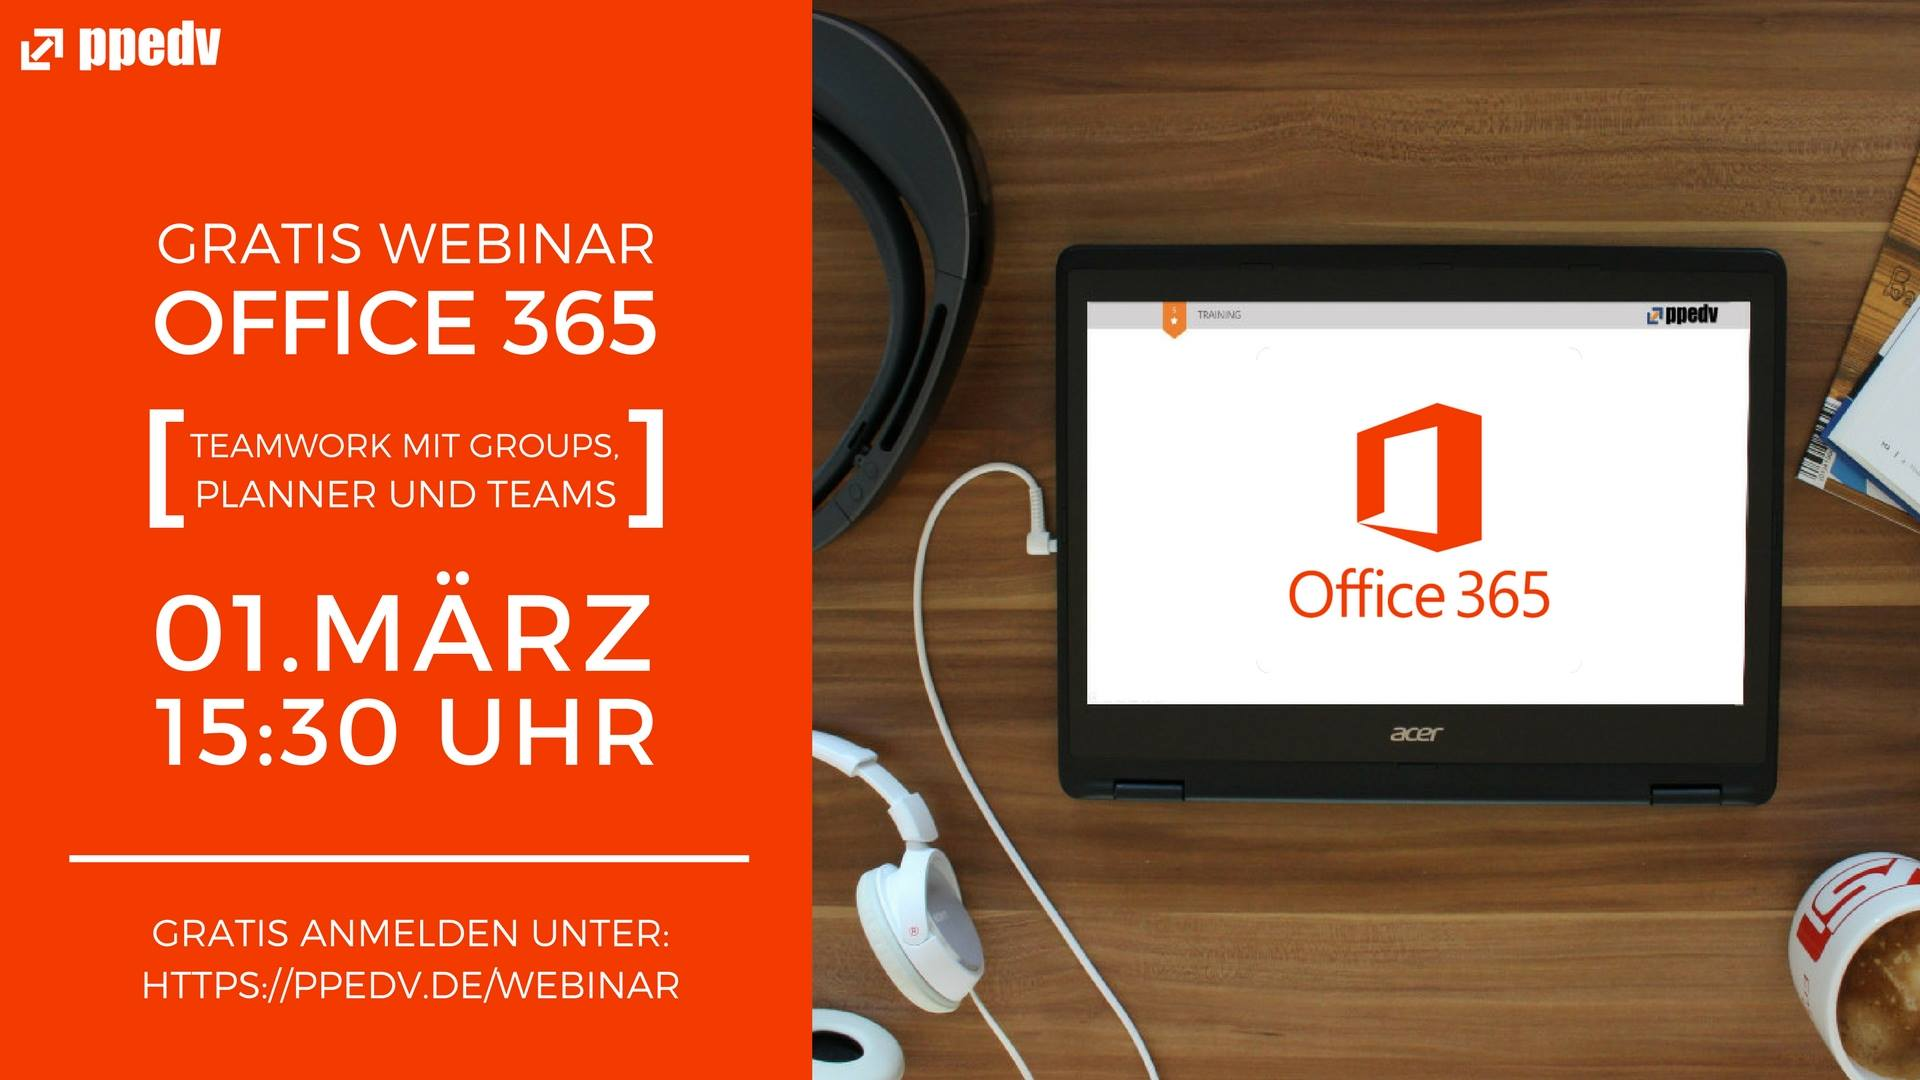 2018/Webinar/Gratis-Webinar-Office365